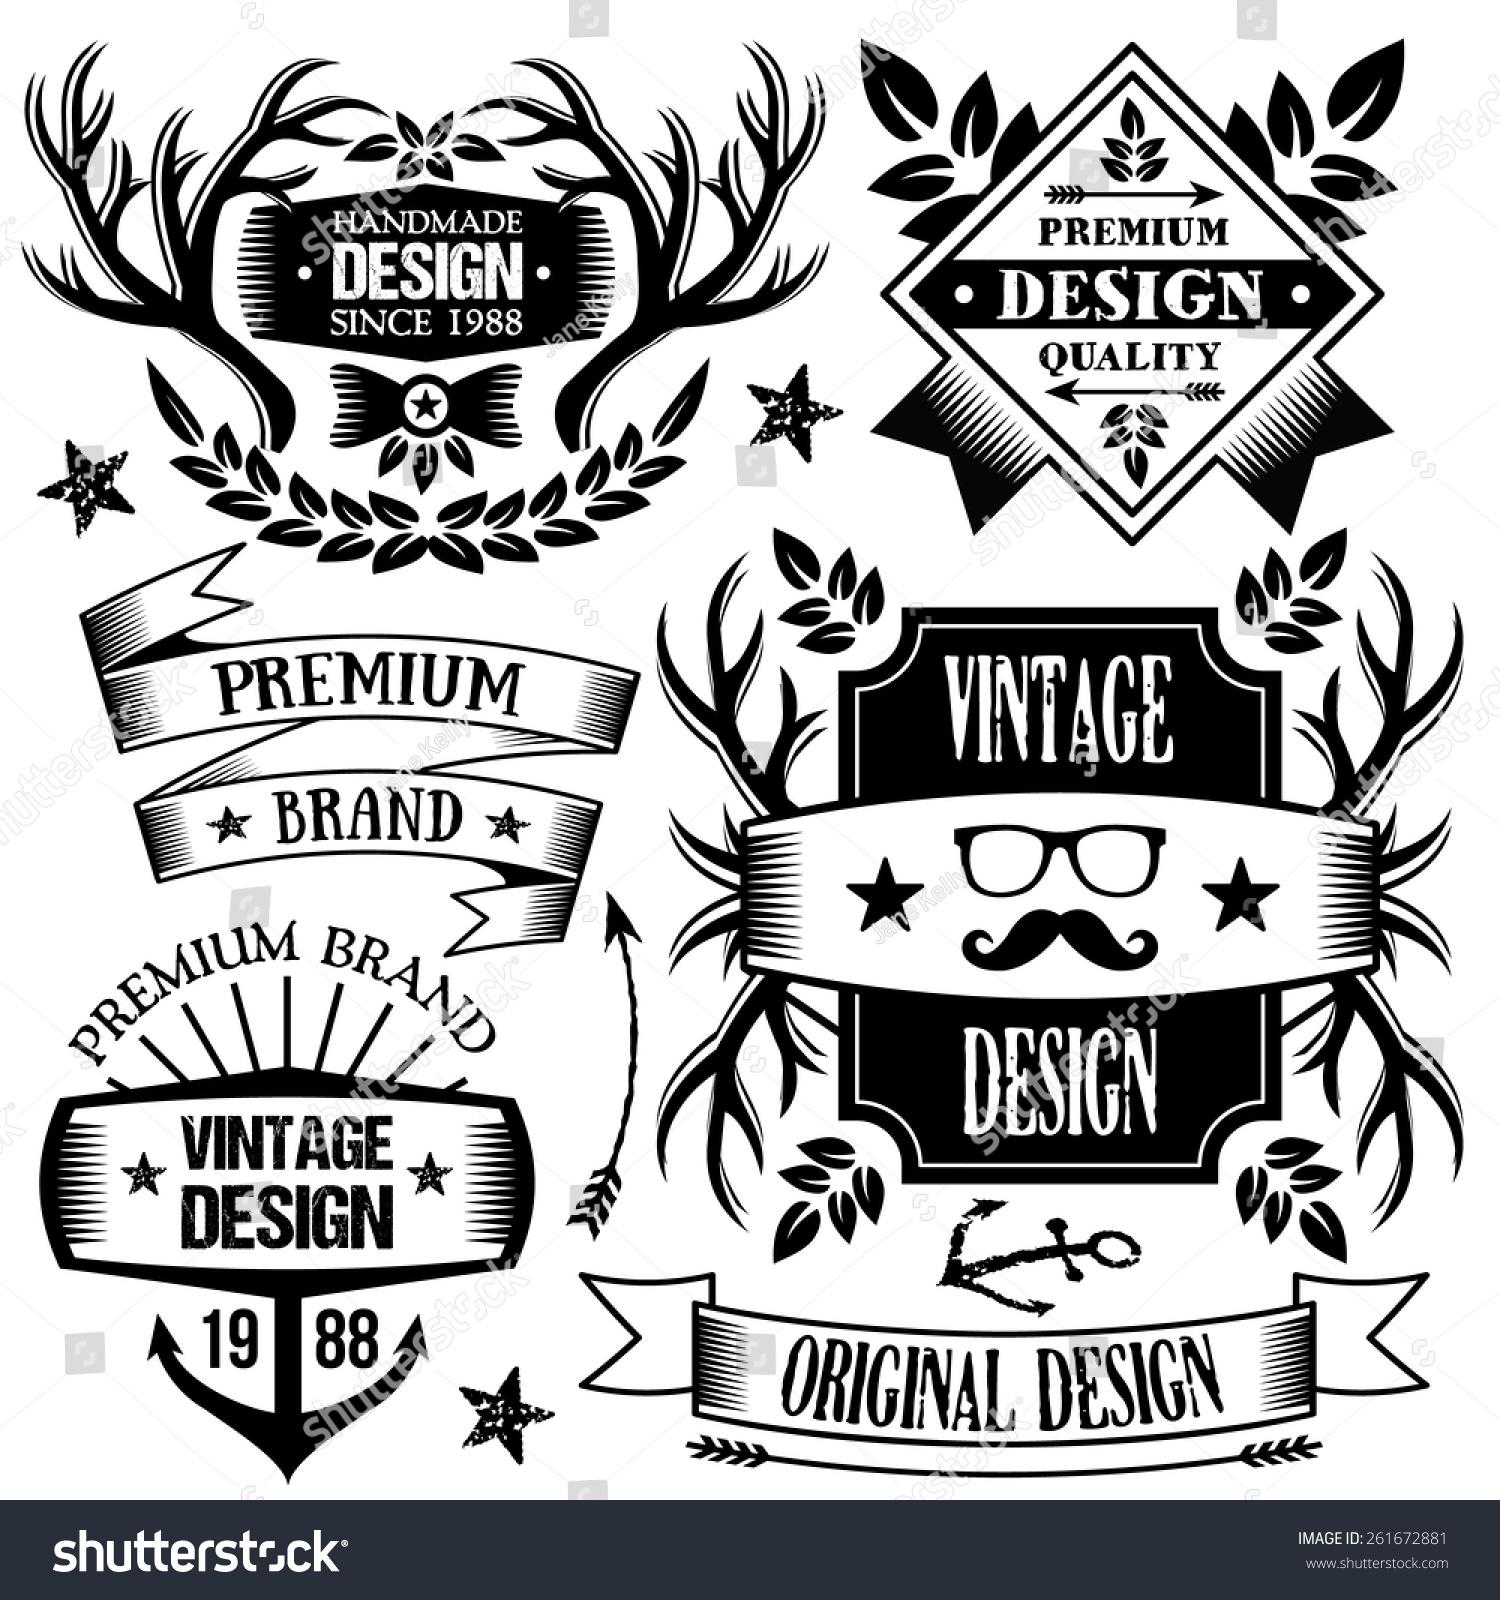 Vintage Badges Labels Ribbons Set Premium Stock Vector 261672881 ...